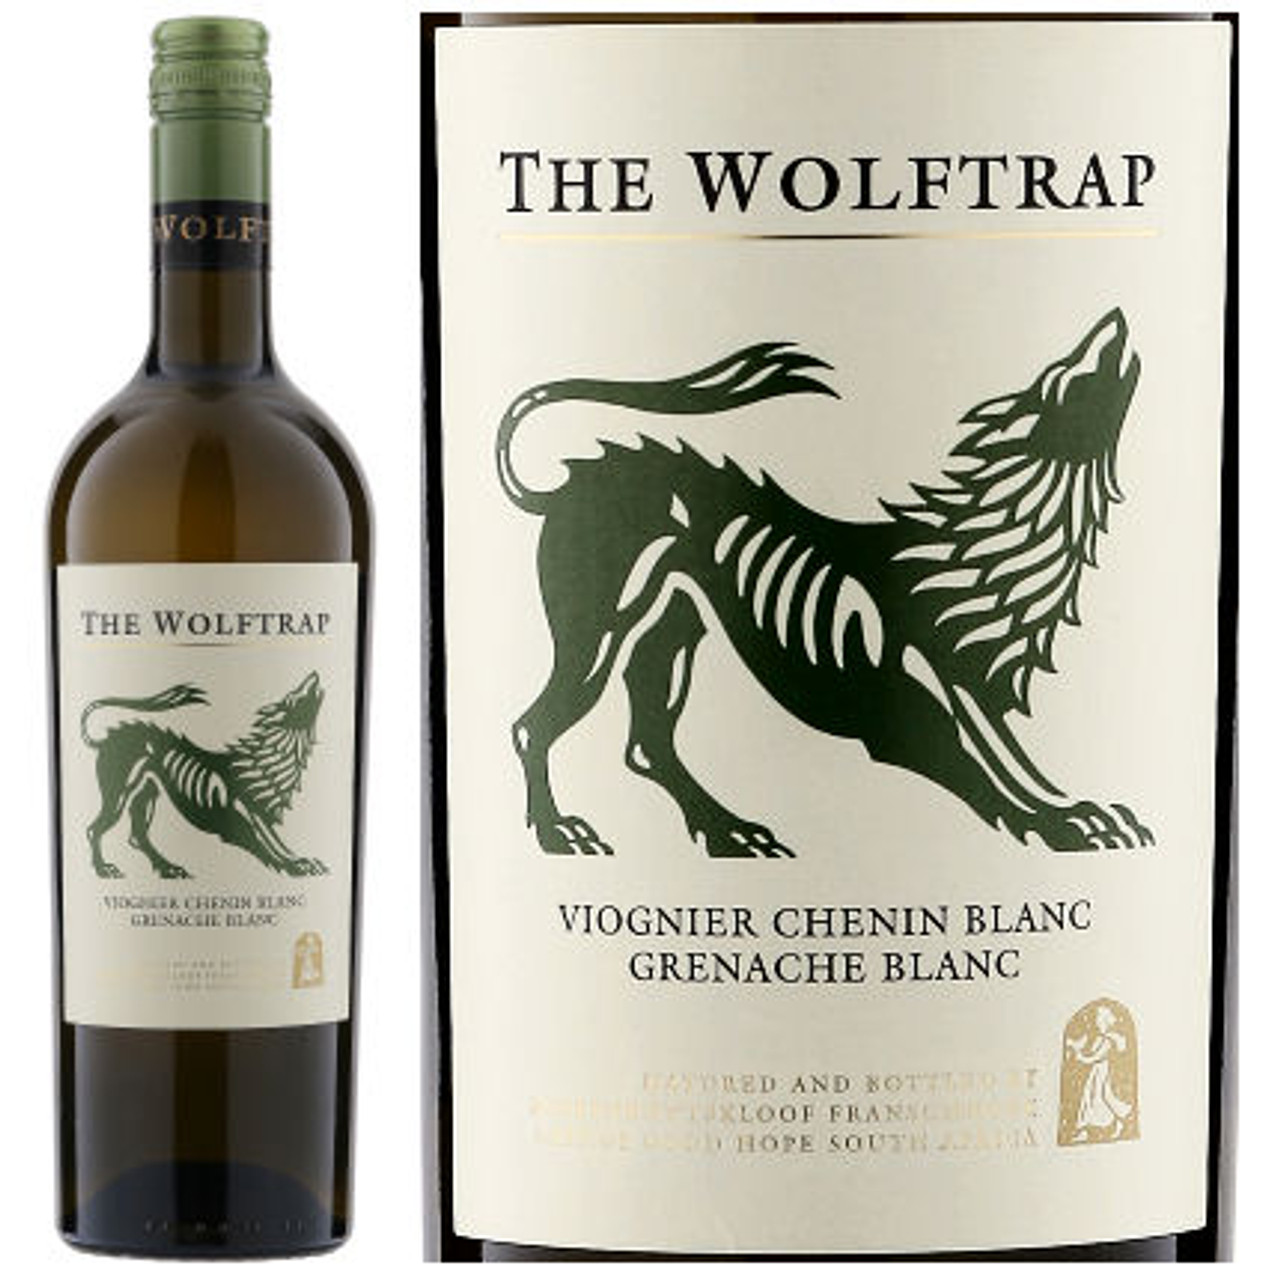 The Wolftrap White Blend